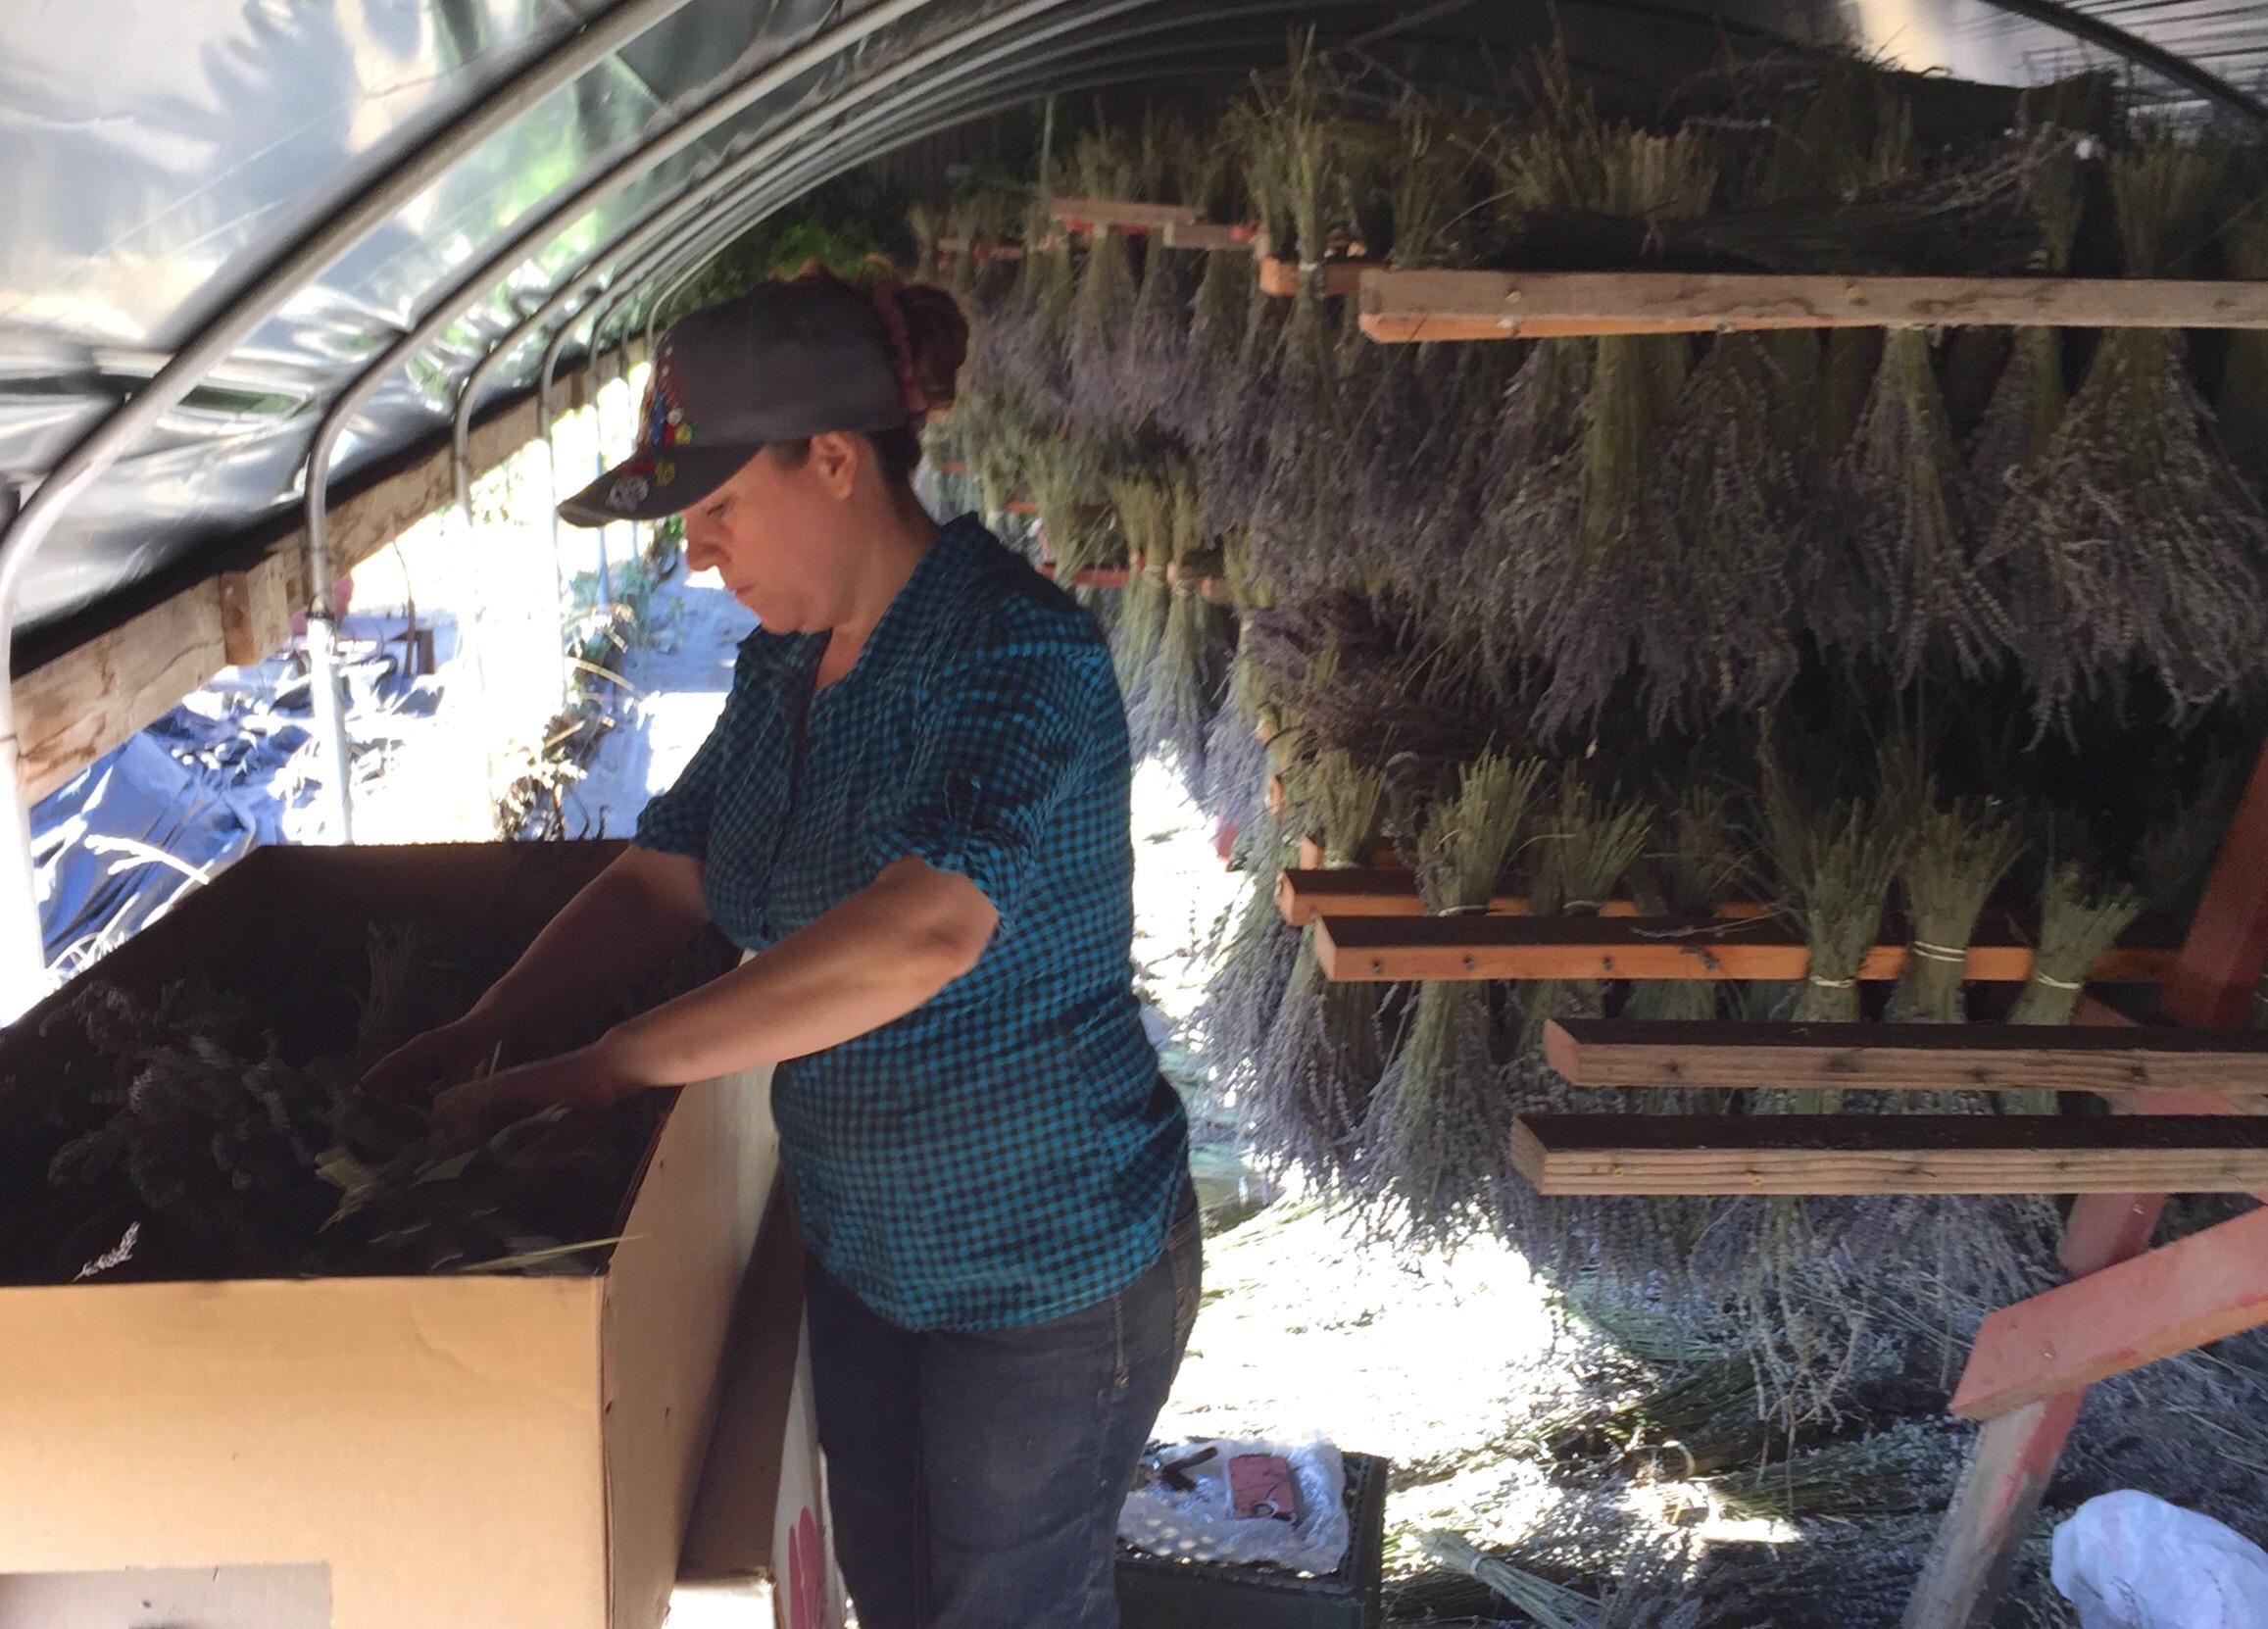 Juanita packing dried lavender at Eatwell Farm